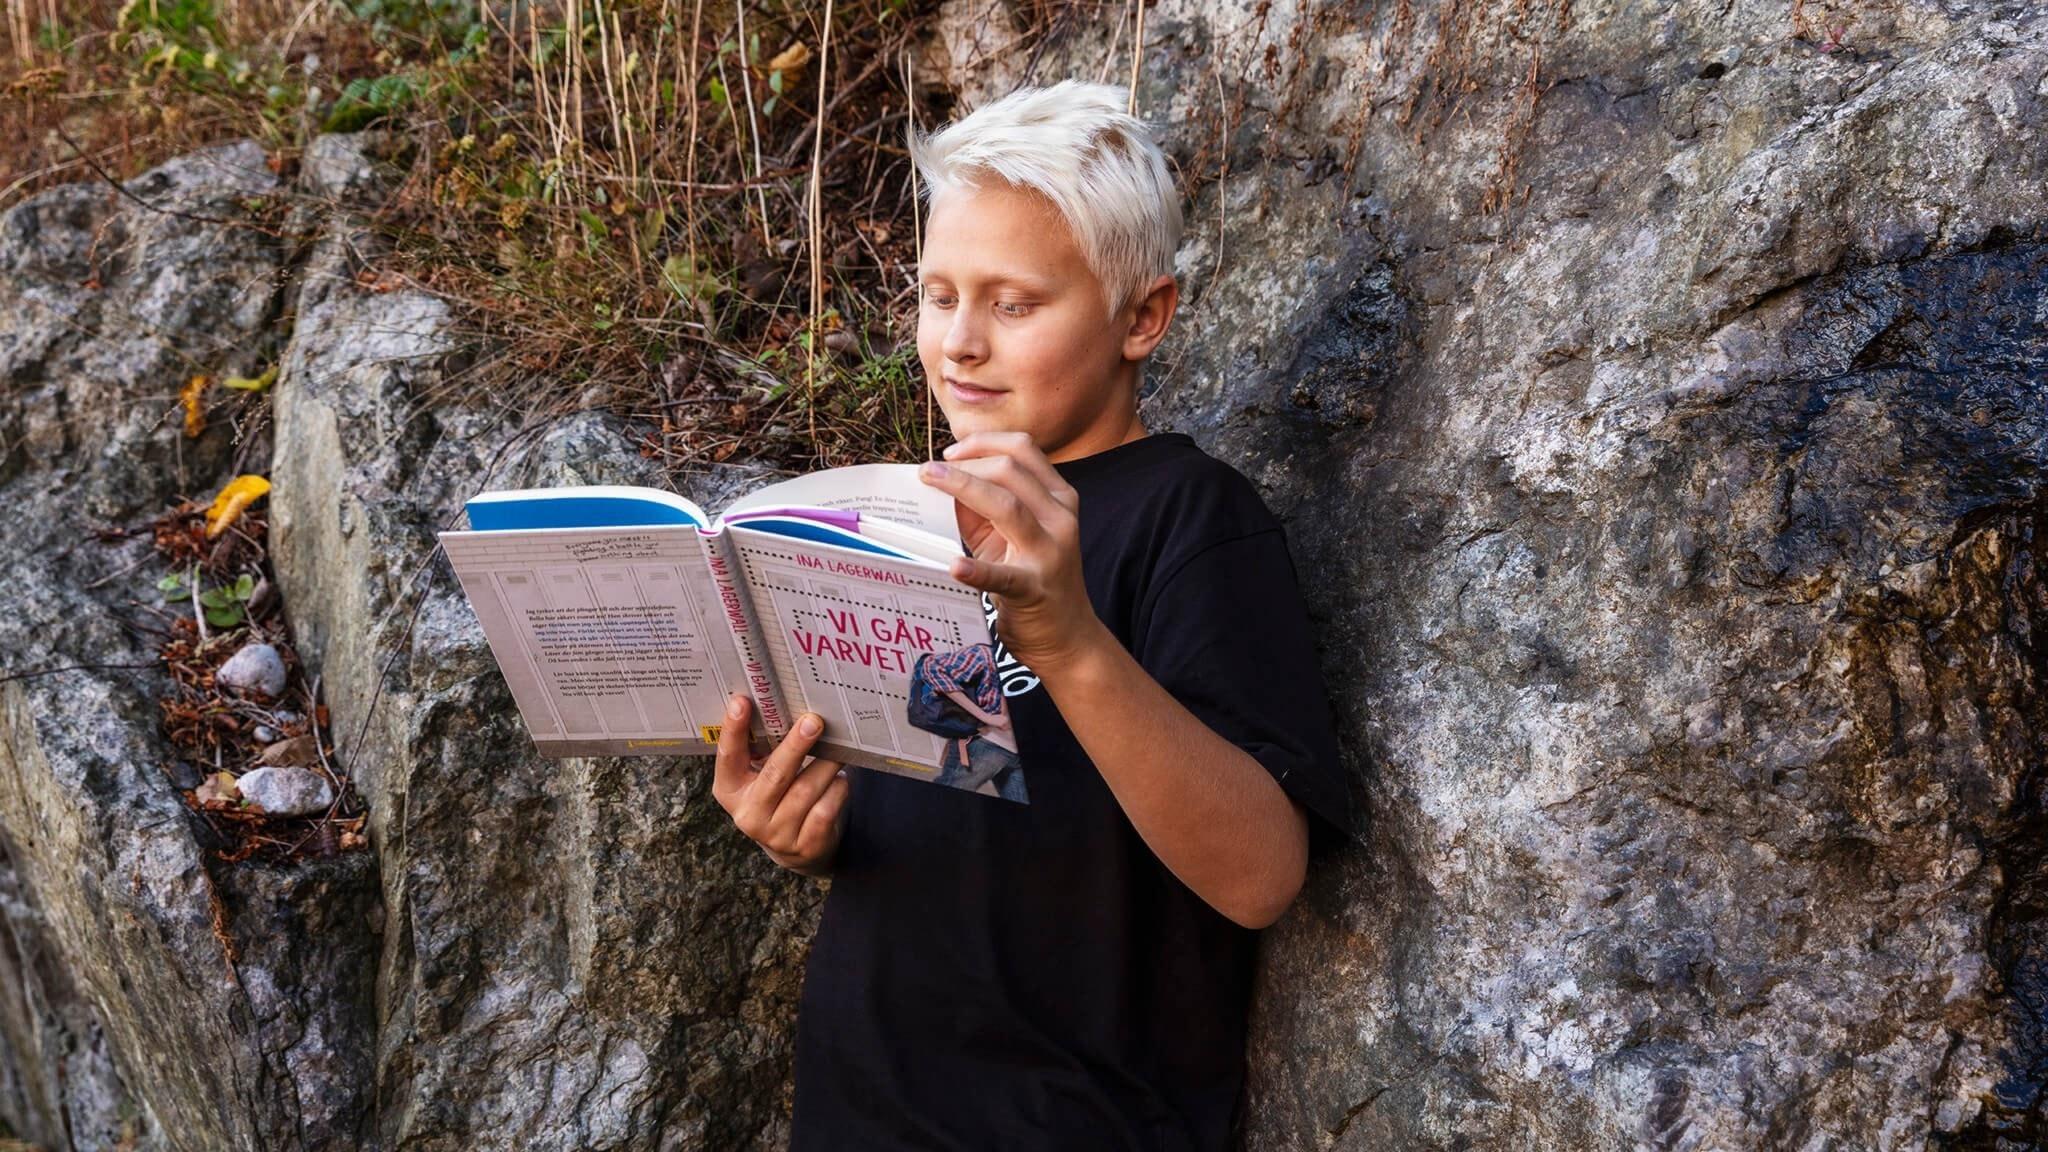 Truls Skau håller i boken Vi går varvet av Ina Lagerwall.